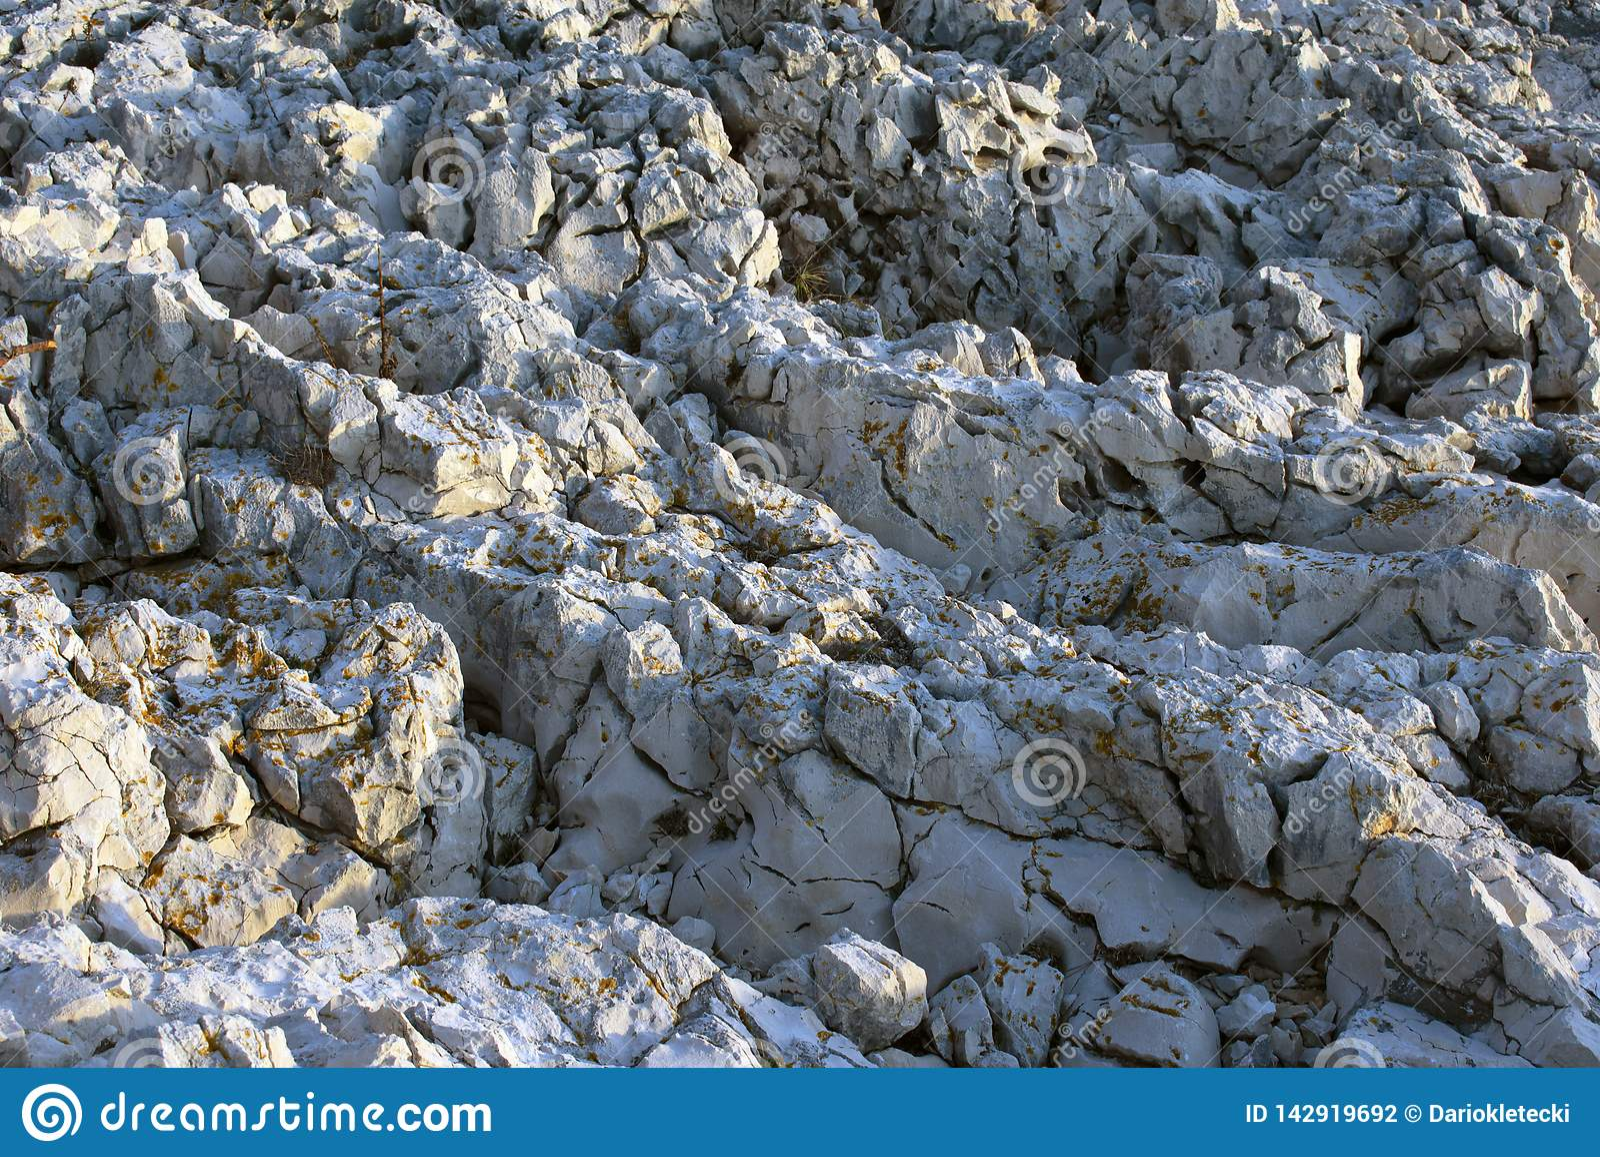 Close up of wild rocks